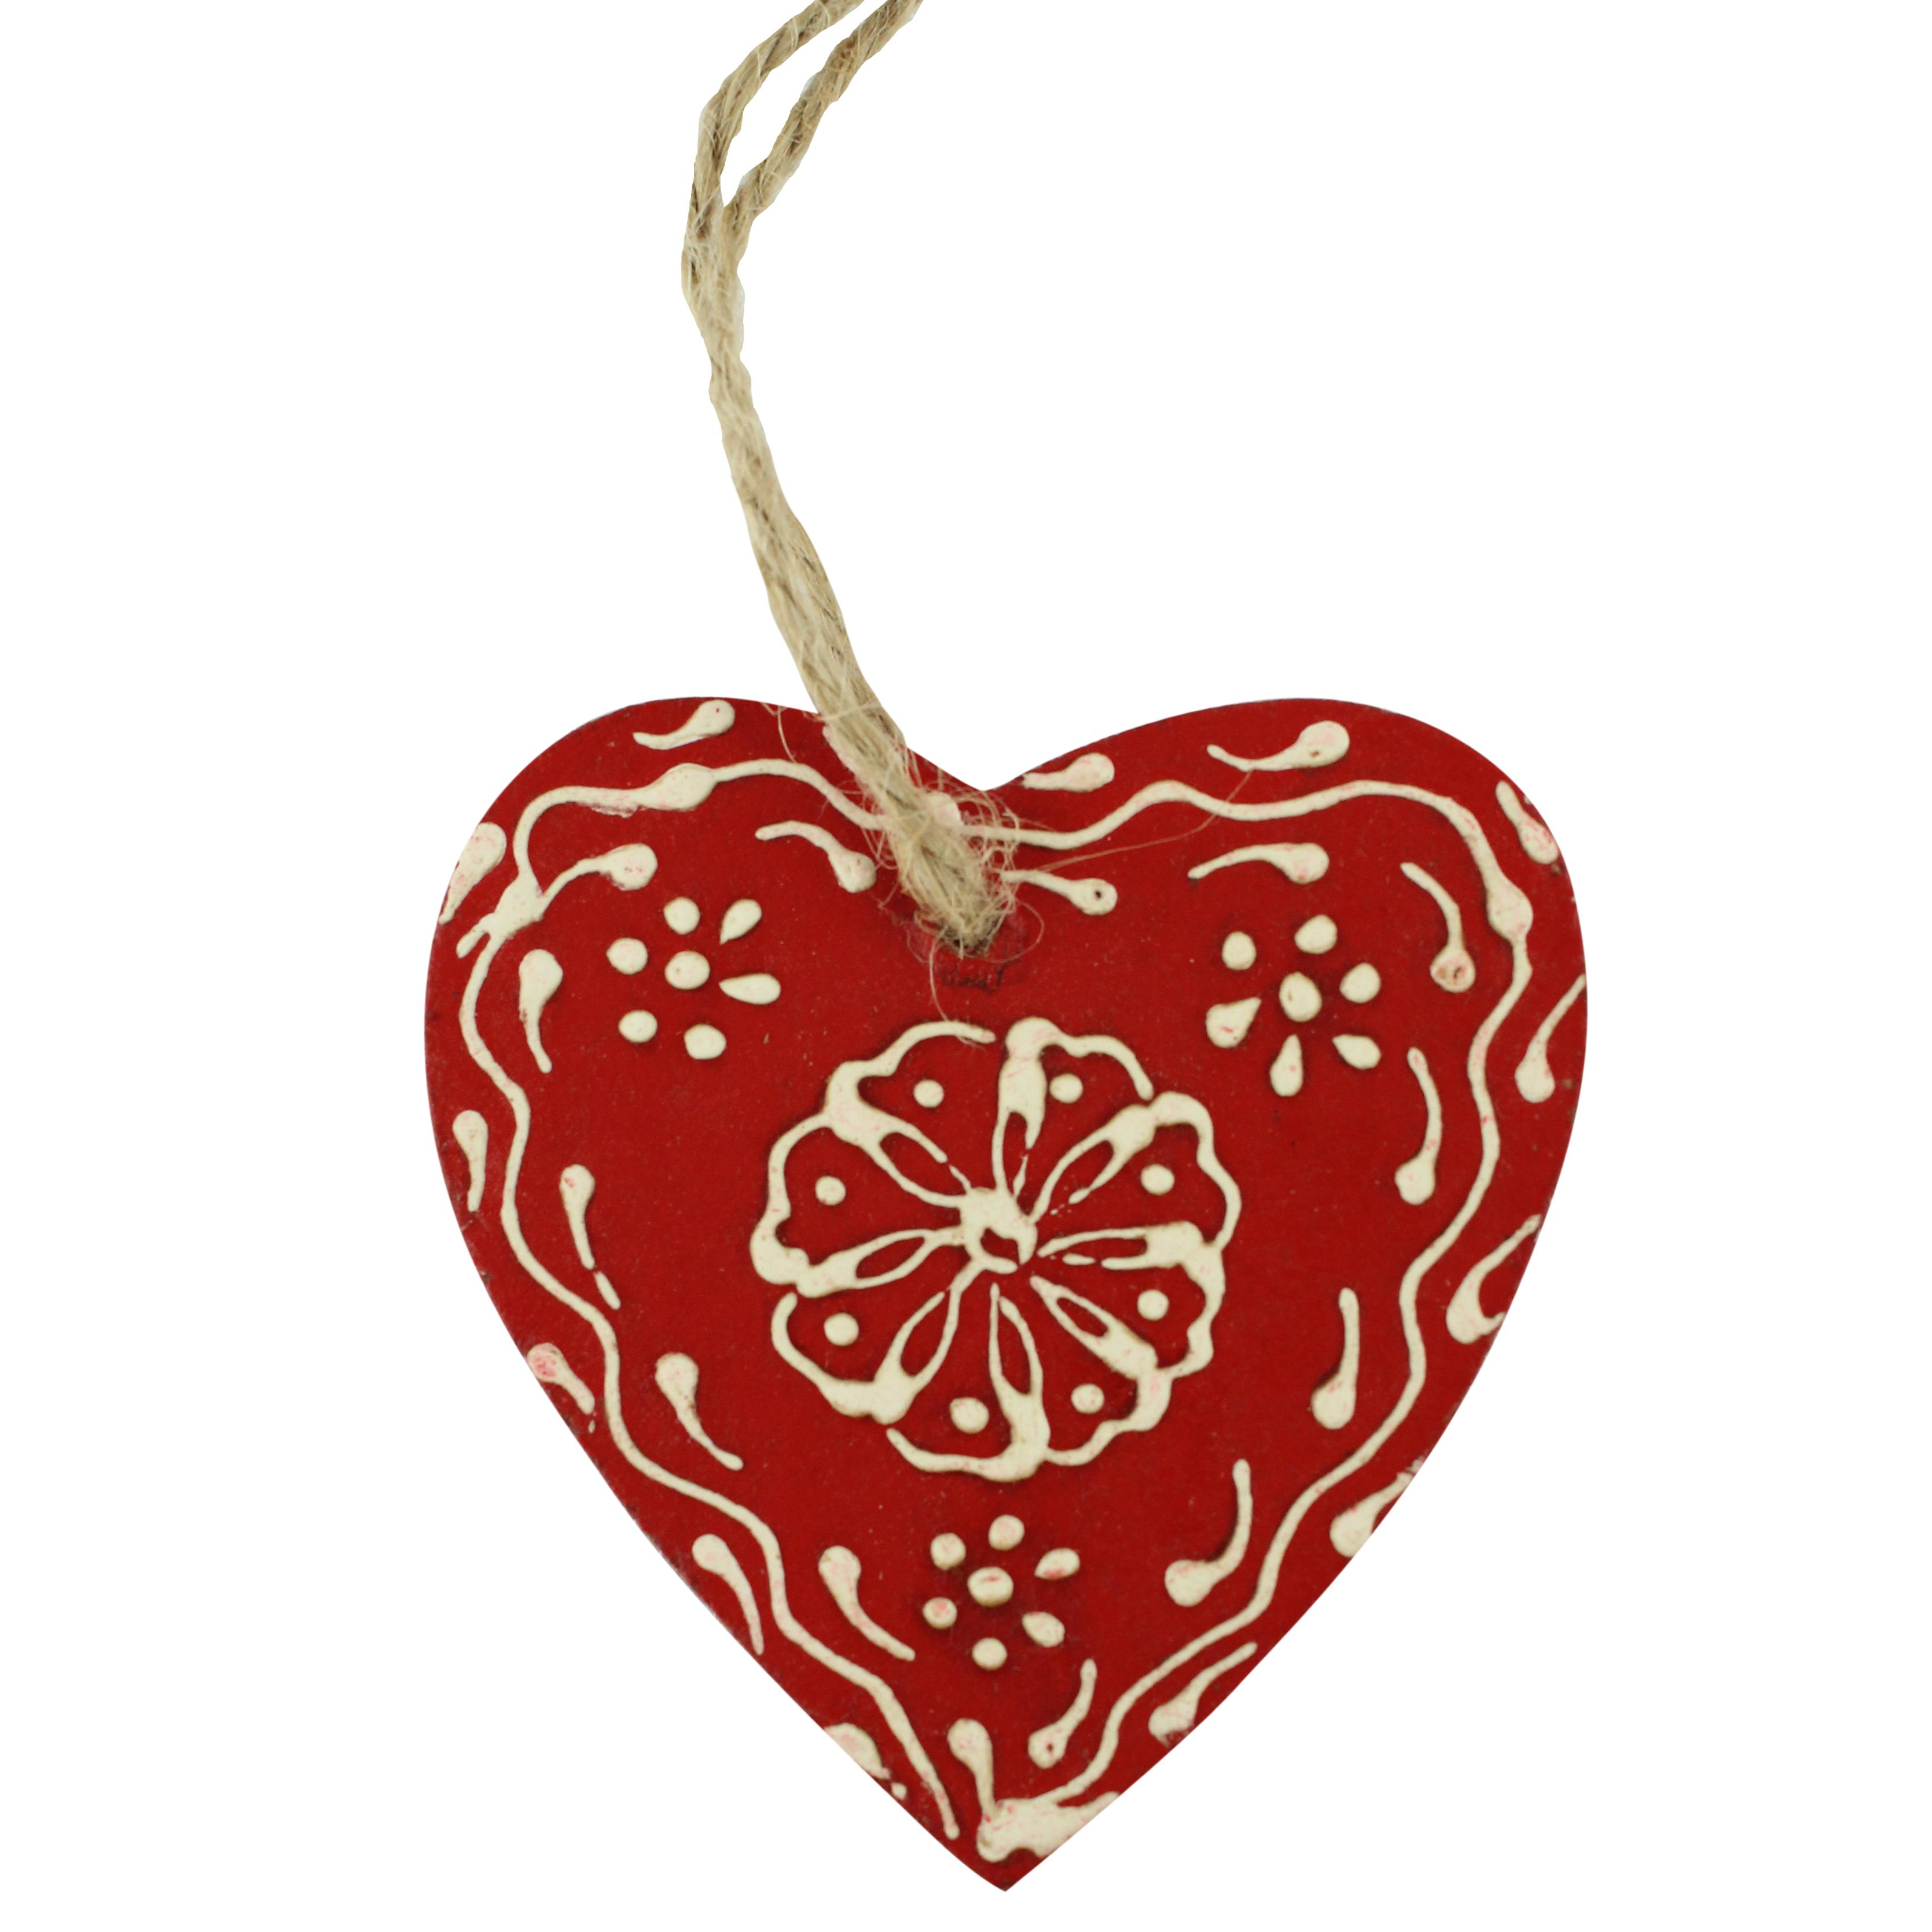 Decoratiune Inima Din Lemn Rosu Cu Alb